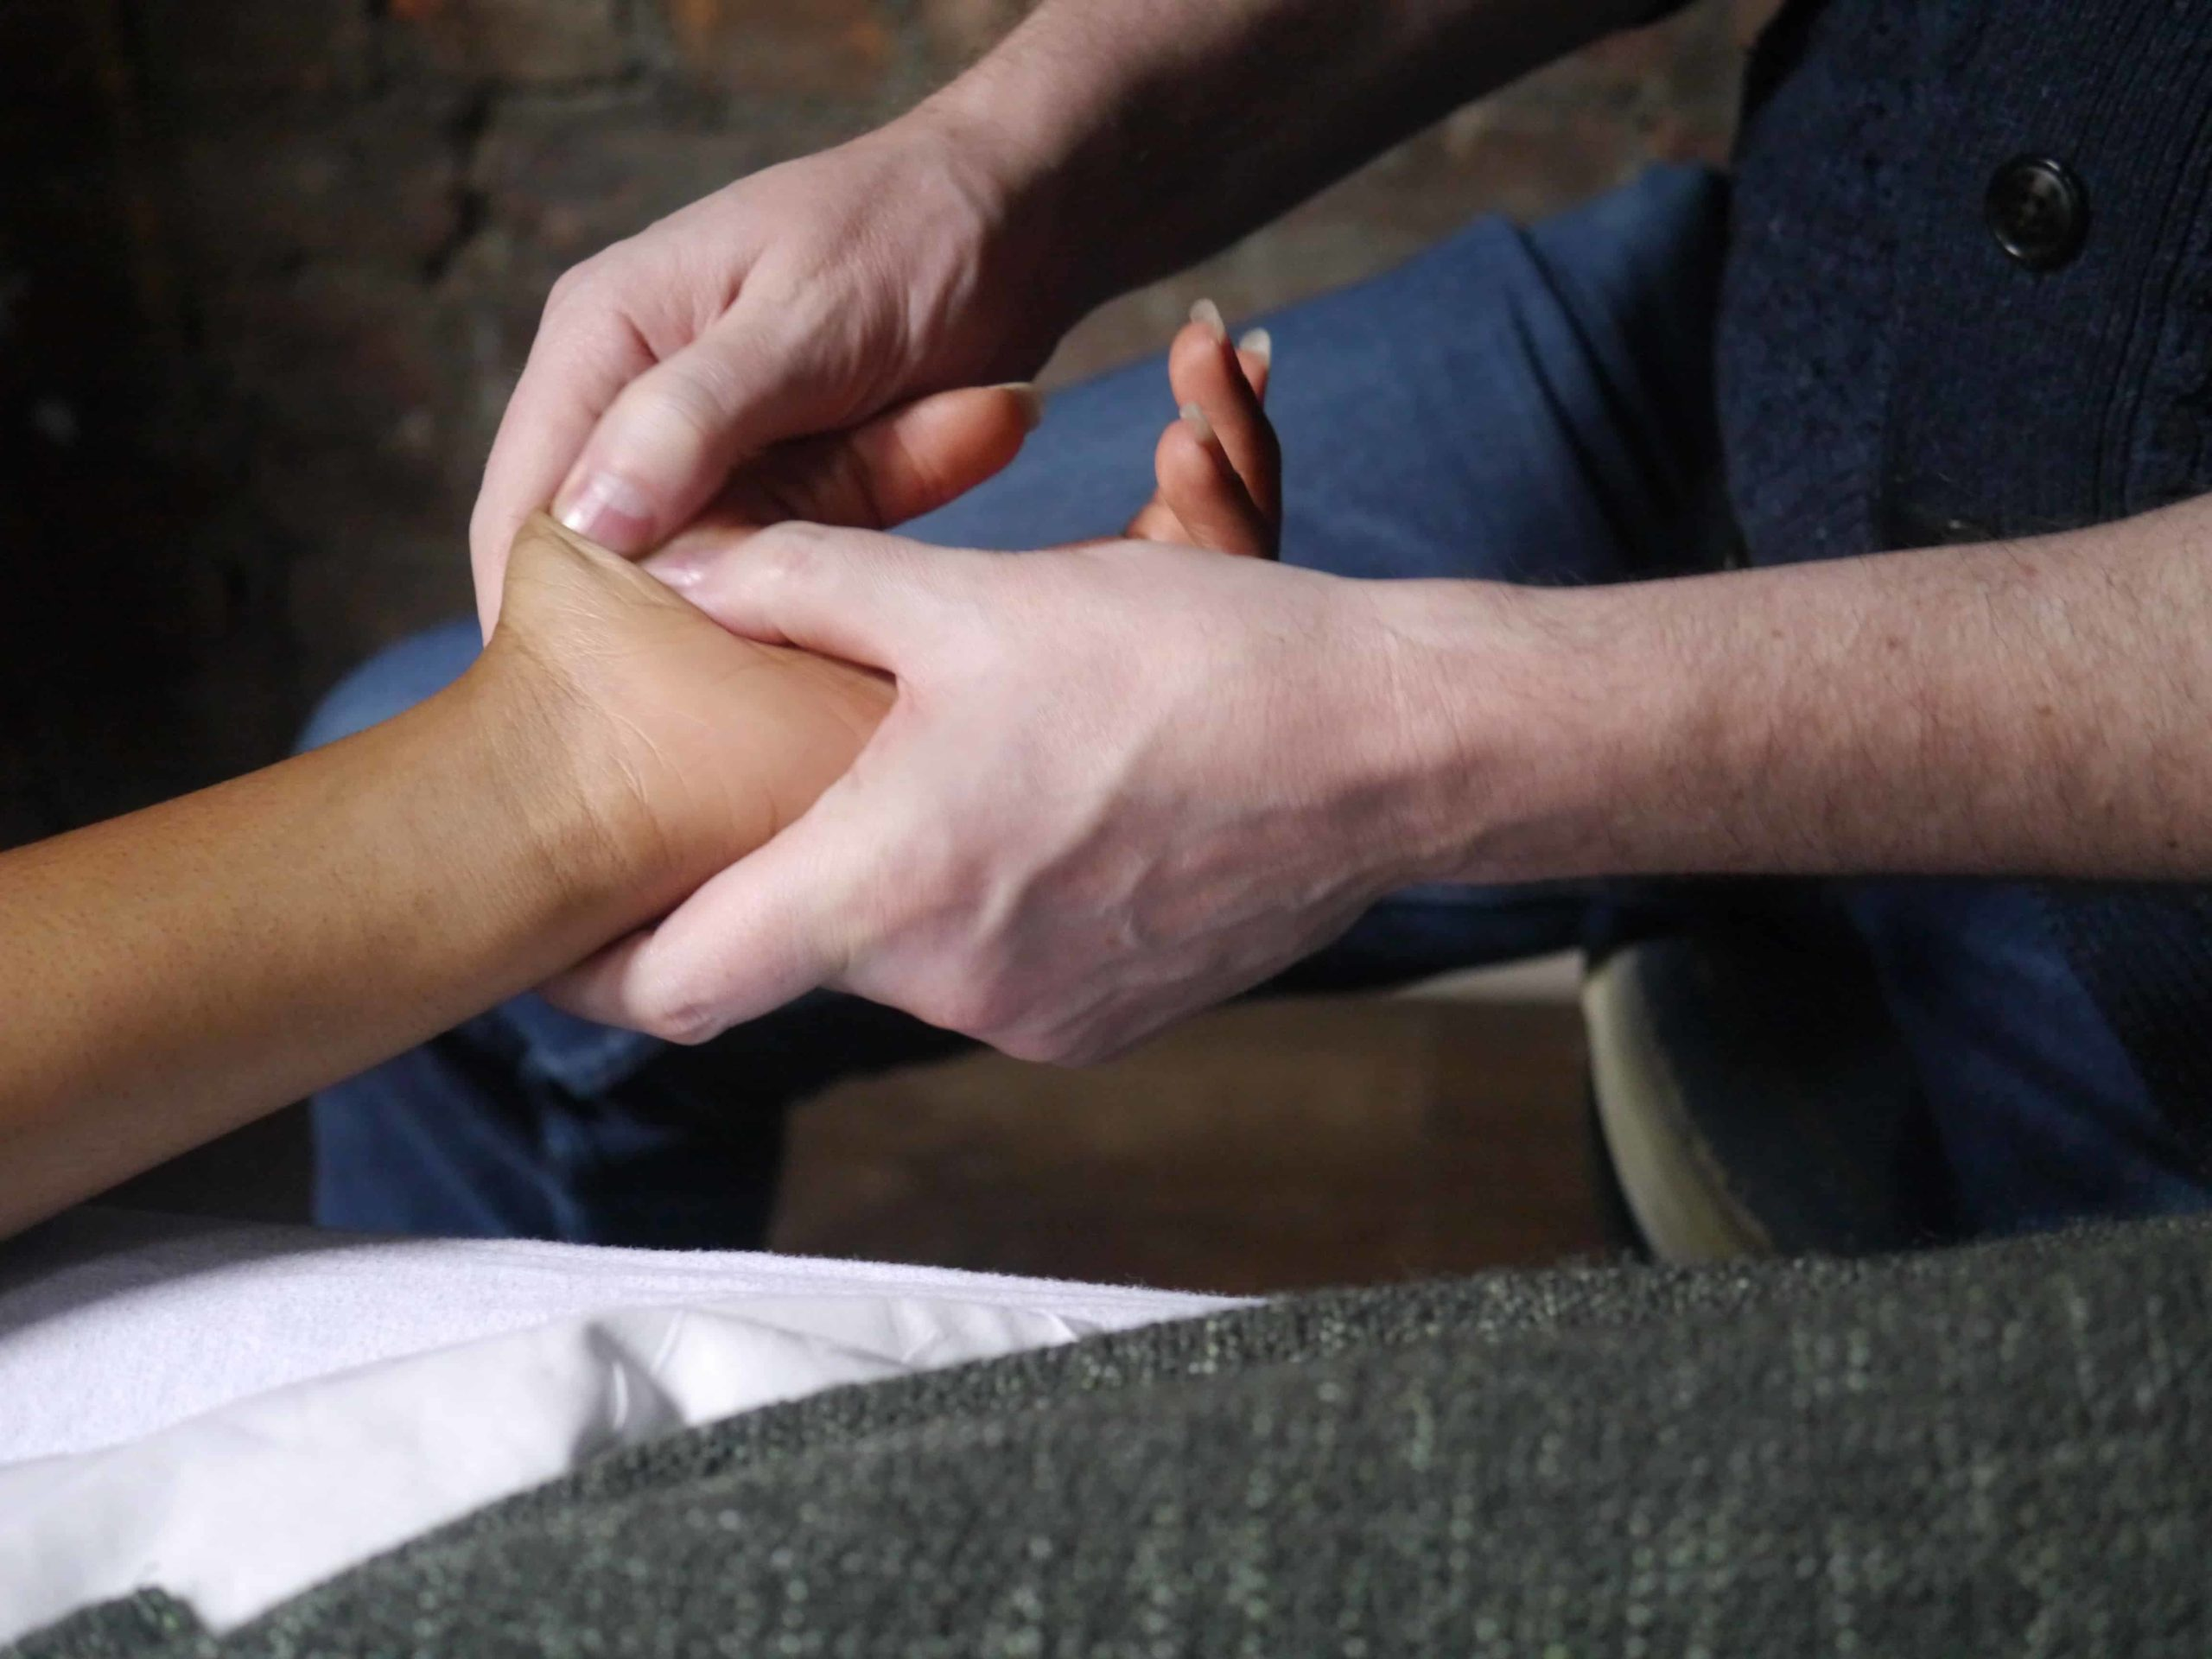 Chronic Wrist Pain & carpal tunnel syndrome